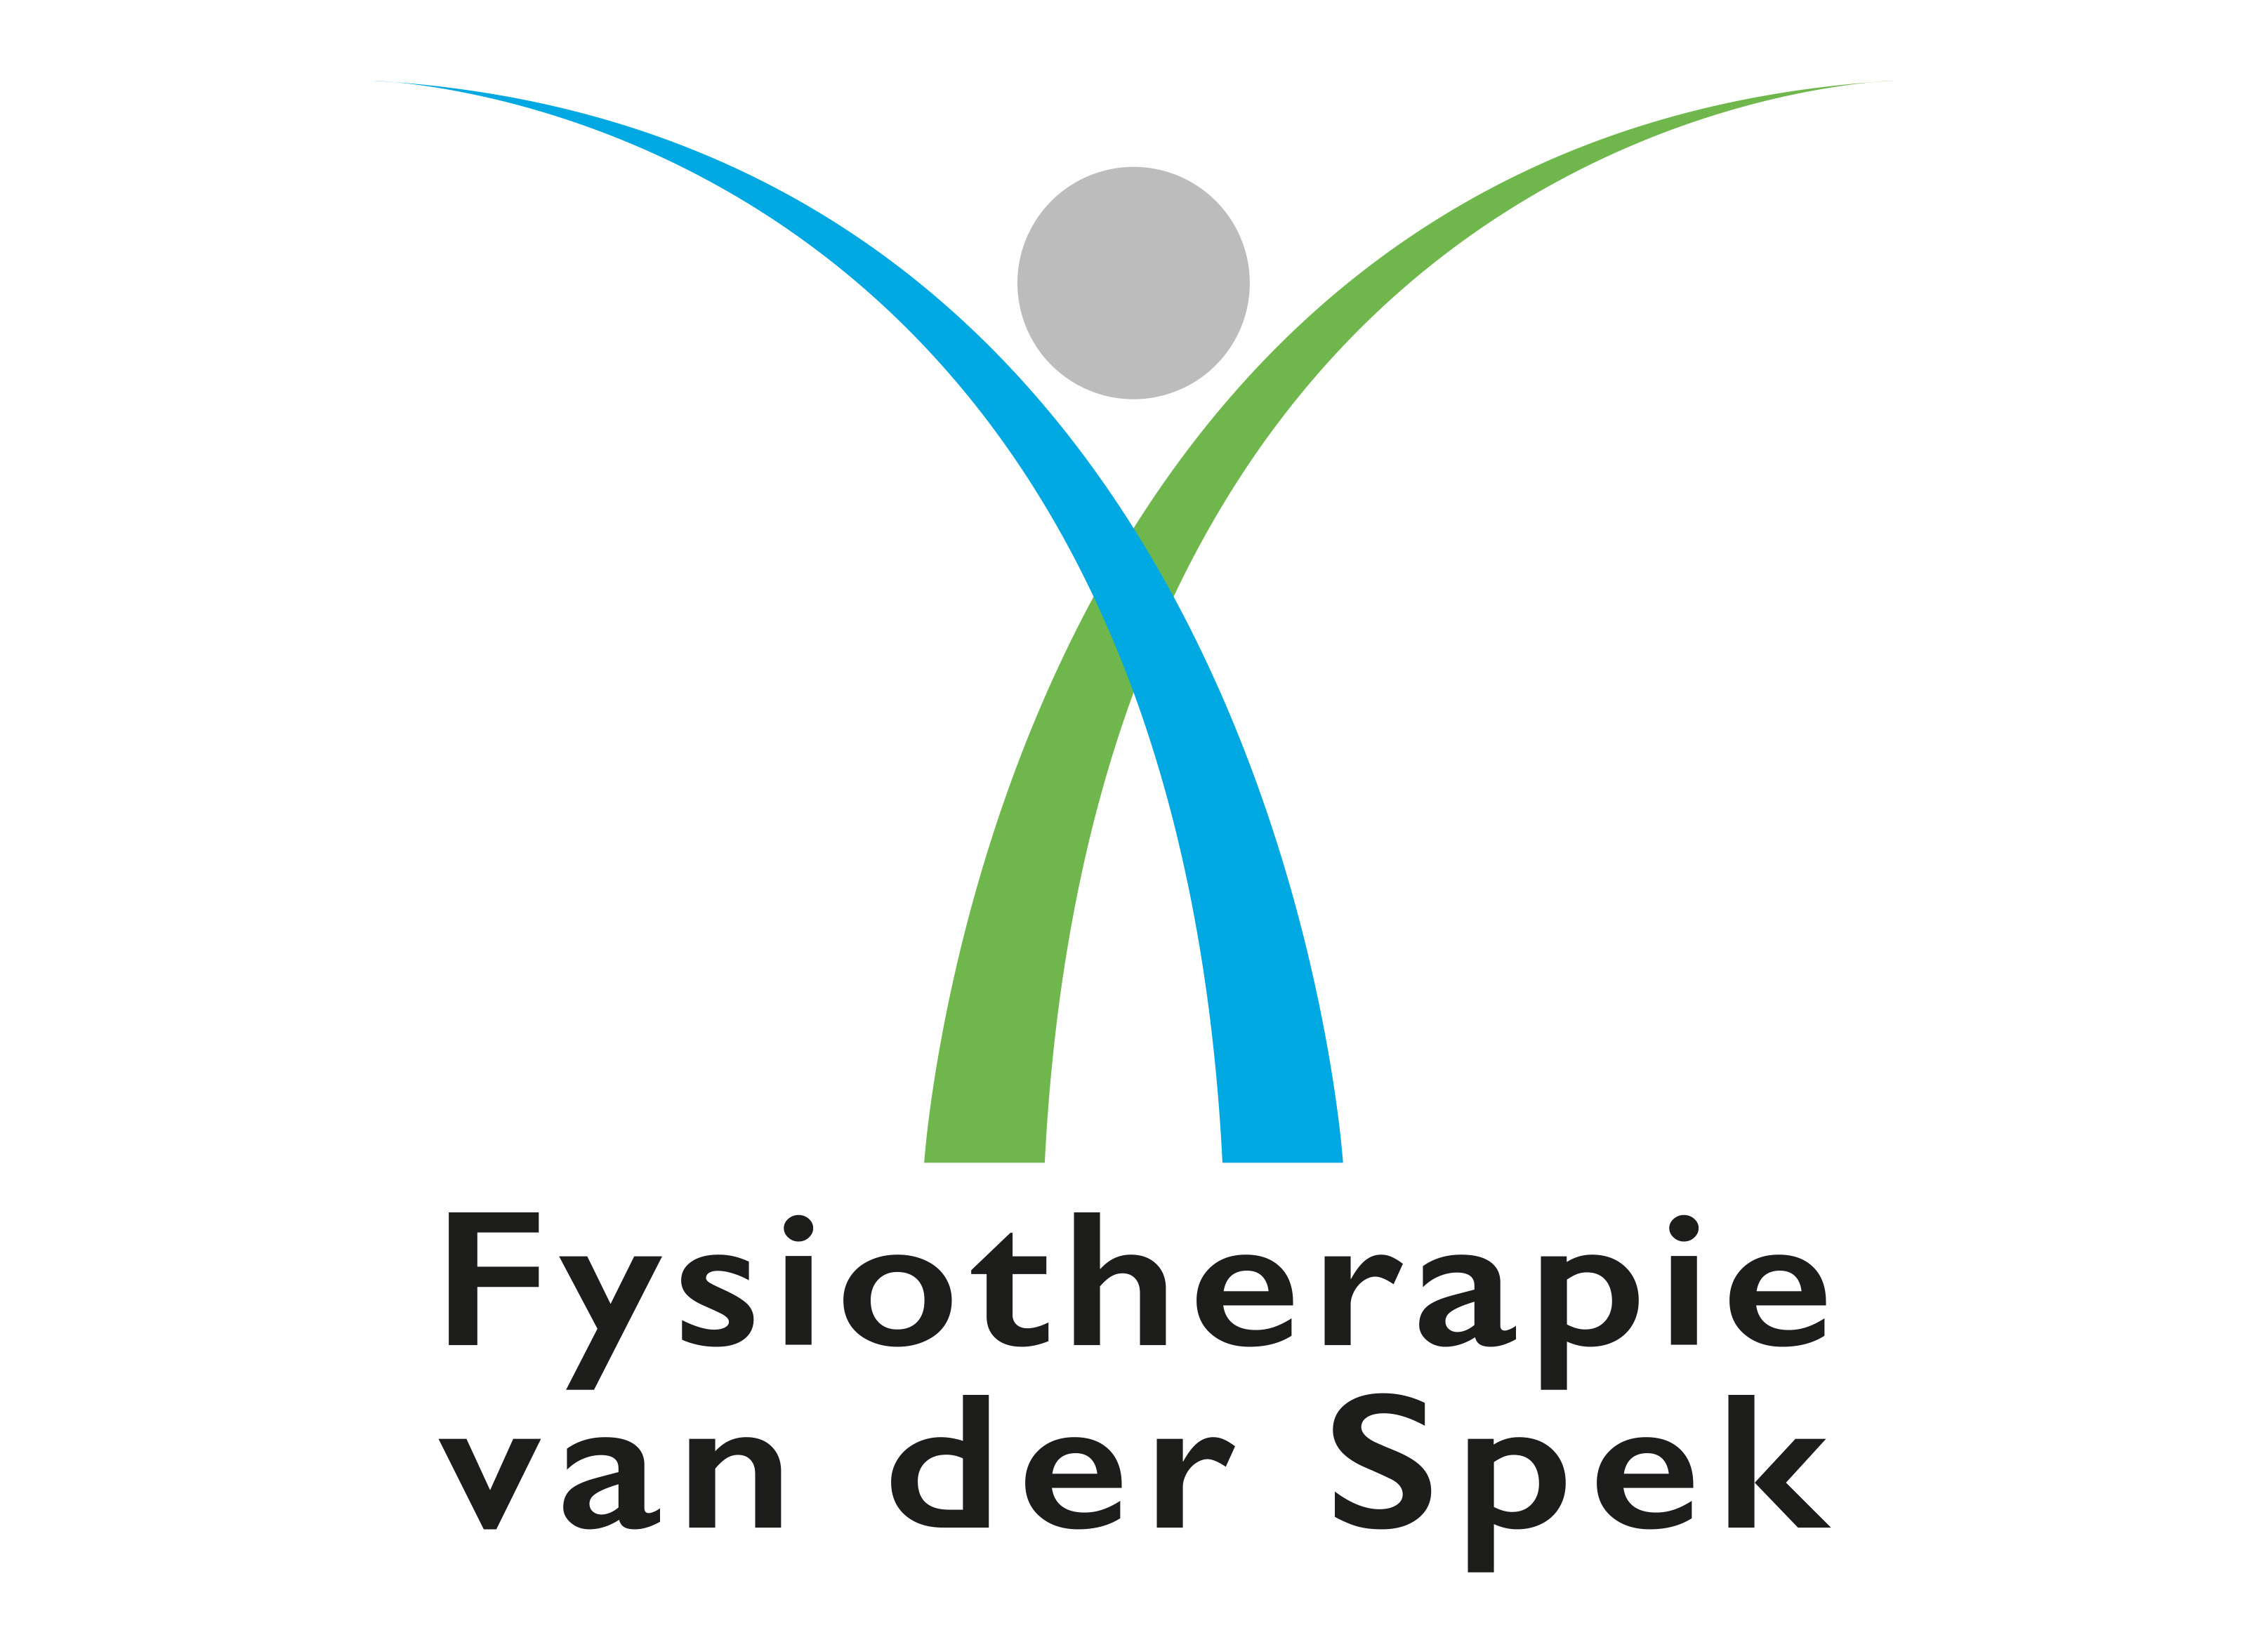 Fysiotherapie van der Spek